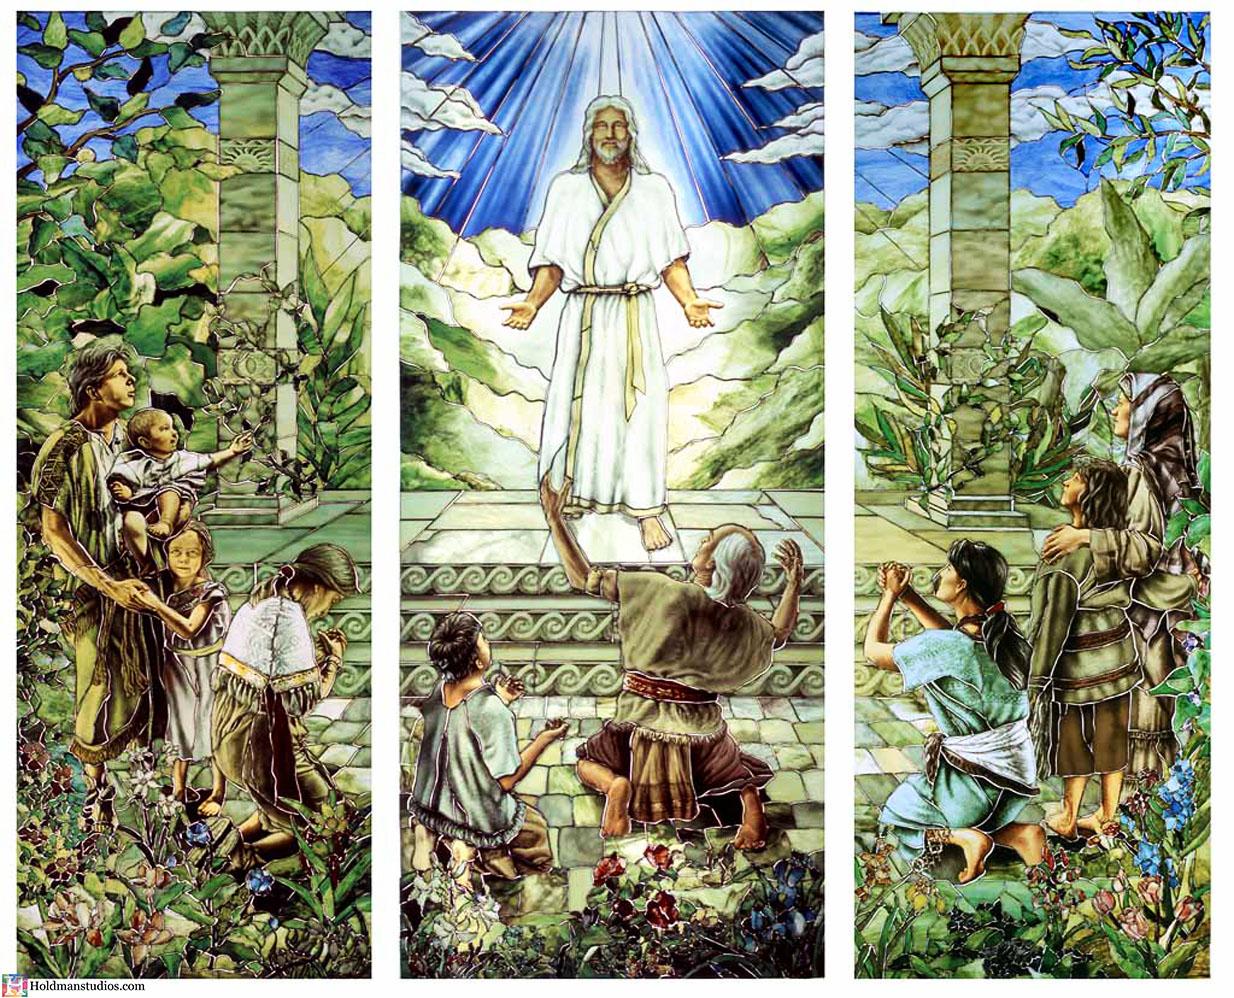 Holdman-Studio-Stained-Art-Glass-Mormon-LDS-Sao-Paulo-Brazil-Temple-Artist-Christ-Comes-to-America-Pannels.jpg